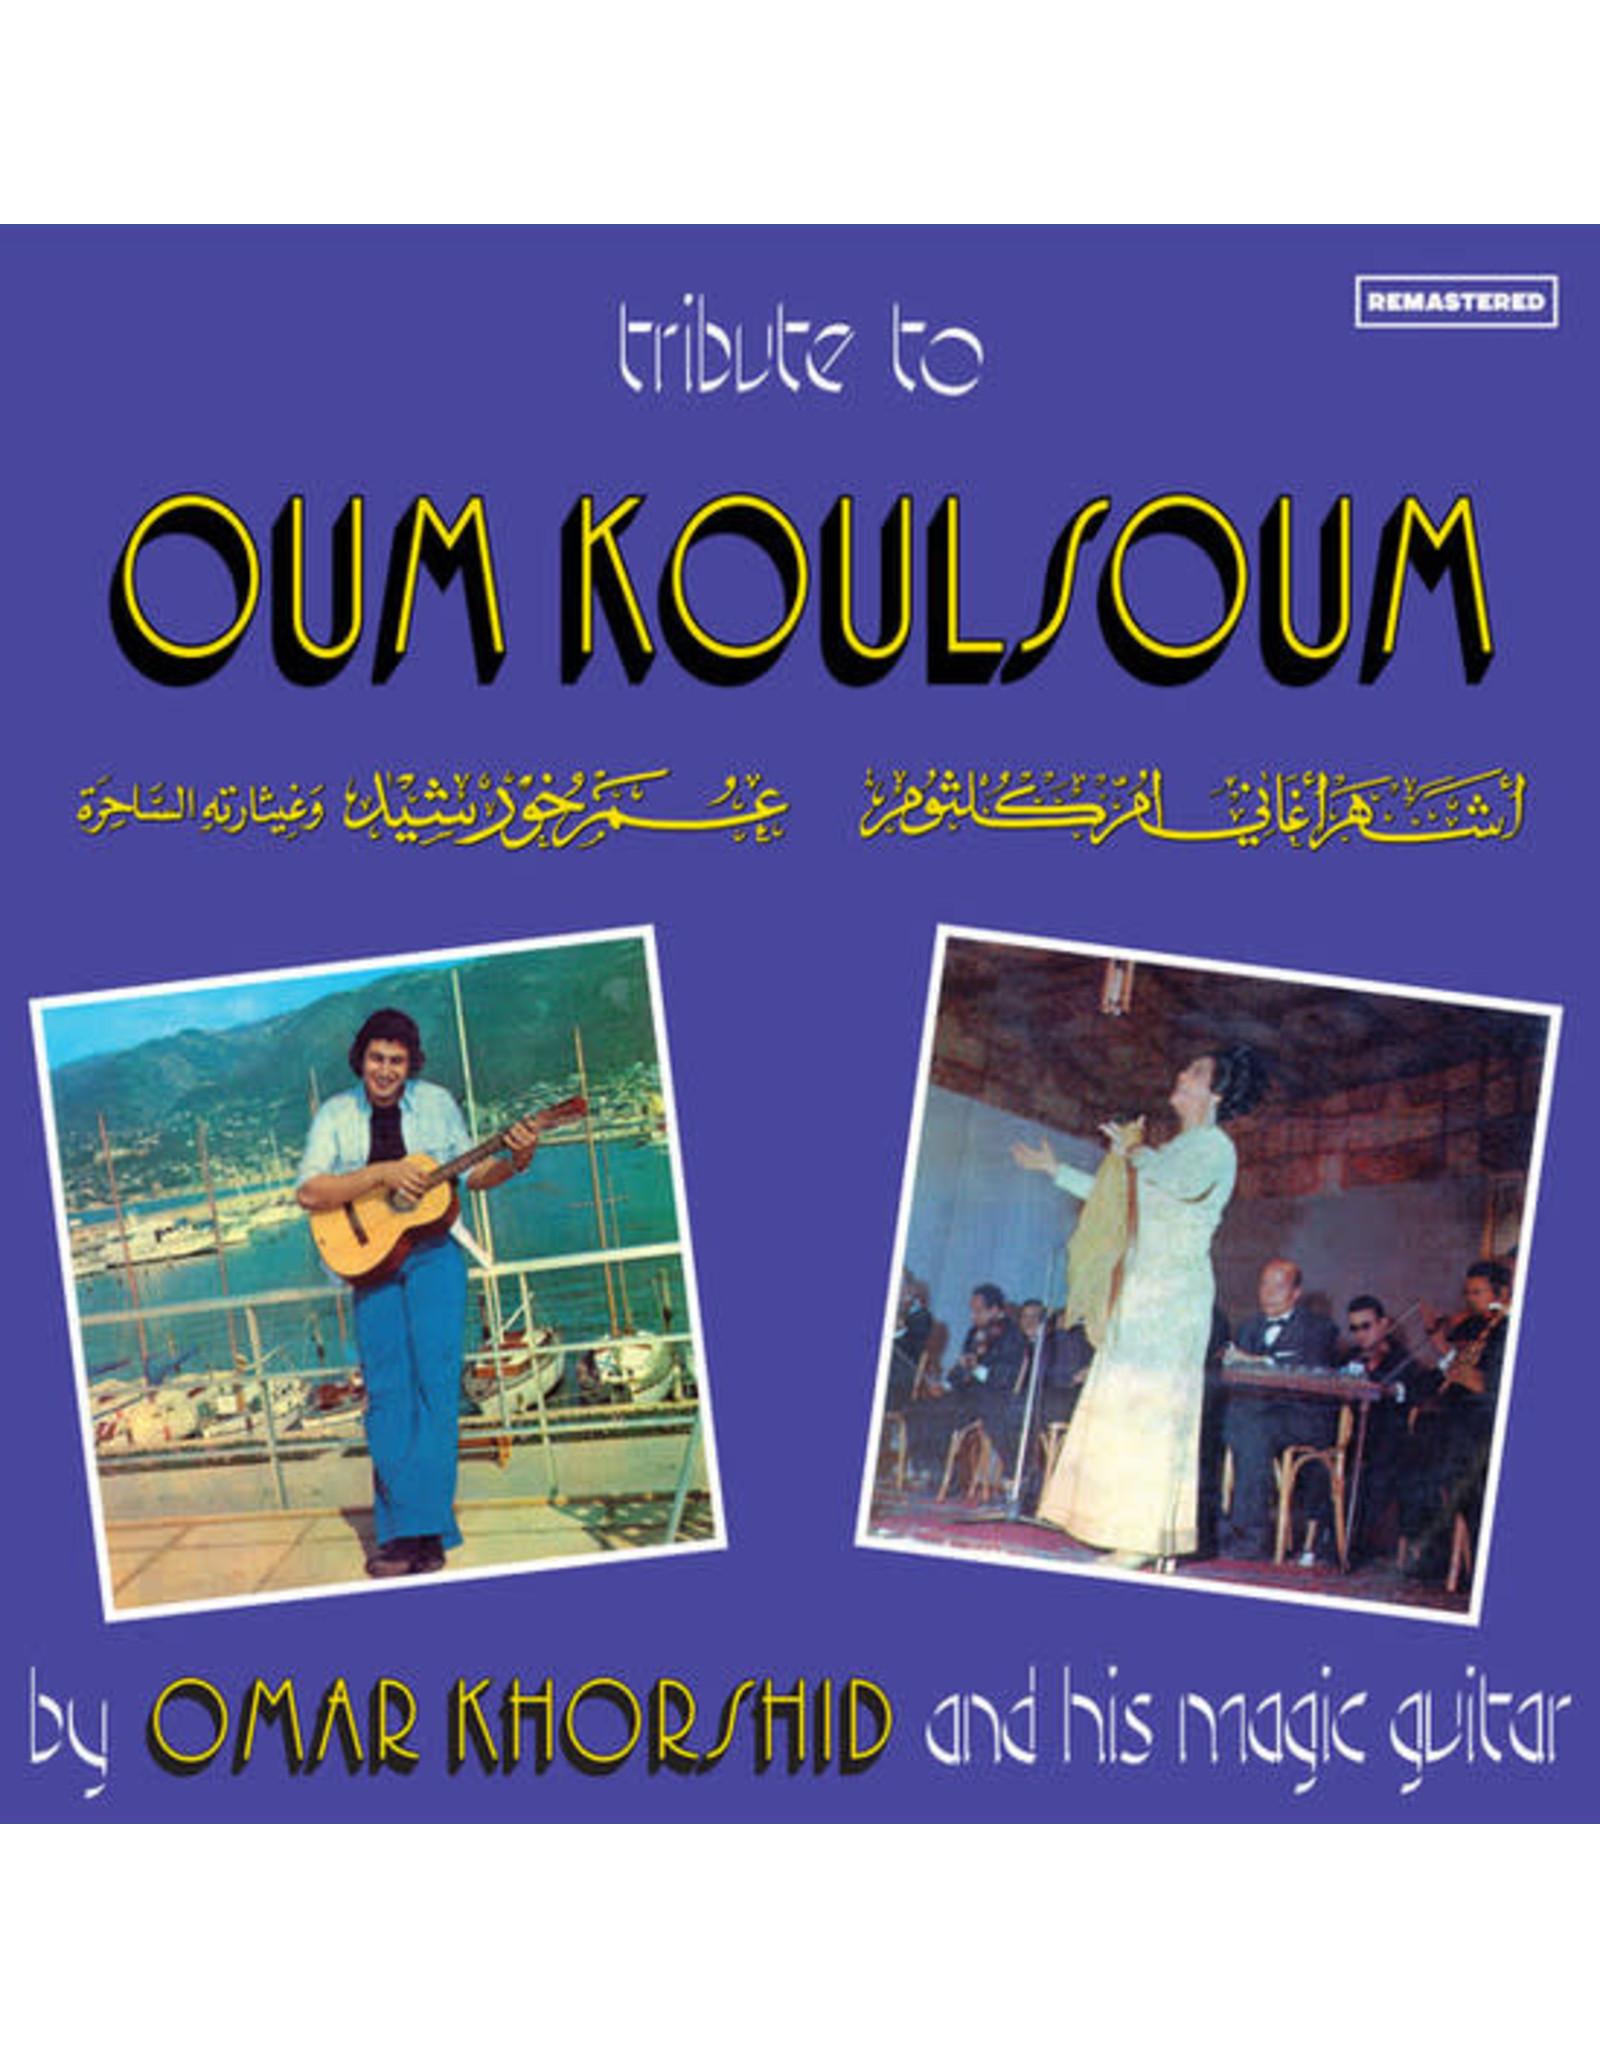 Right Track Khorshid, Omar: Tribute to Oum Koulsoum LP